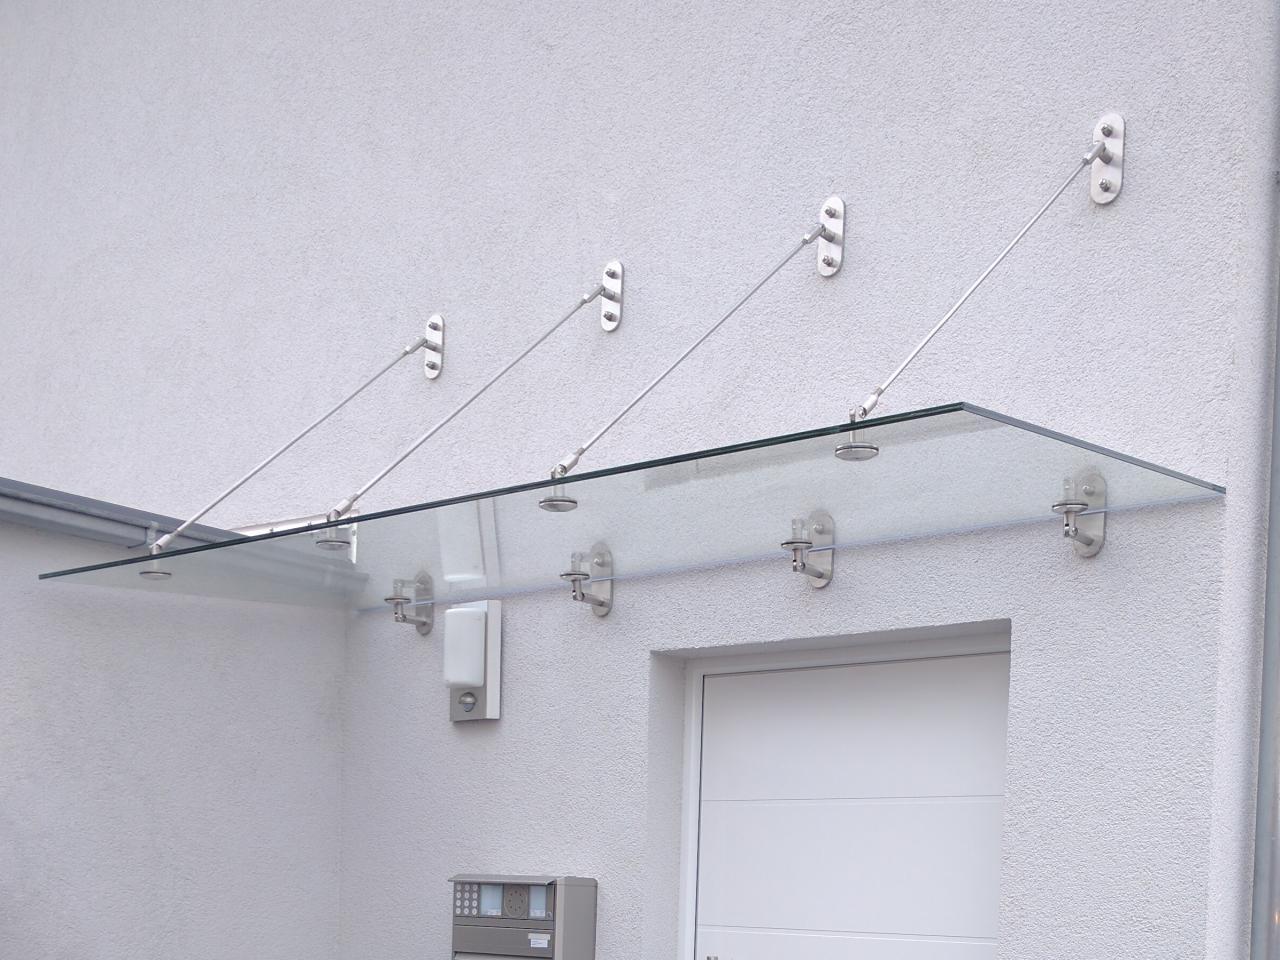 Berühmt Costco 10x20 Vordach Stahlrahmen Fotos - Bilderrahmen Ideen ...